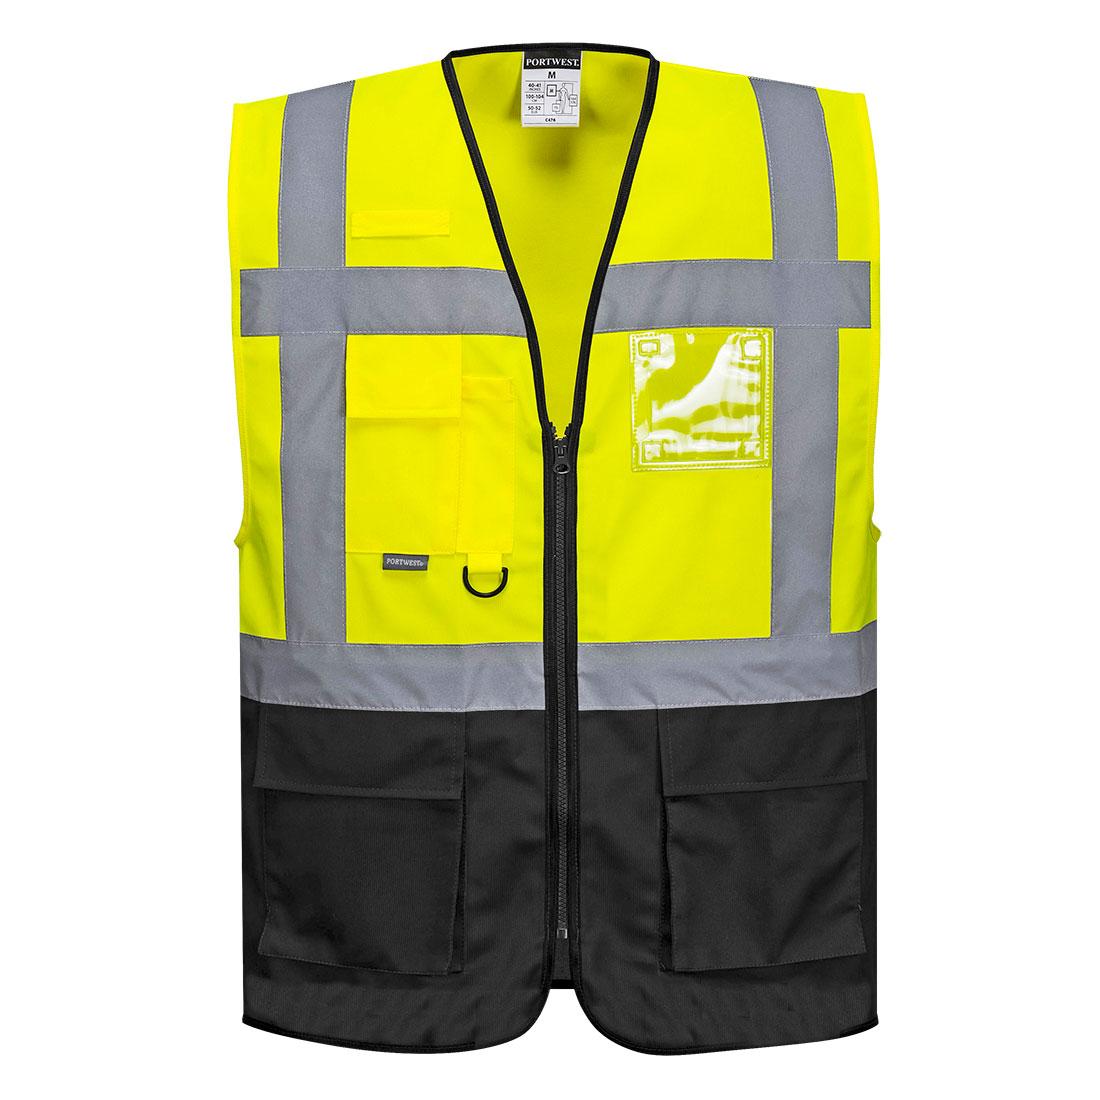 Warsaw Executive Vest Yellow/Black XXXLR